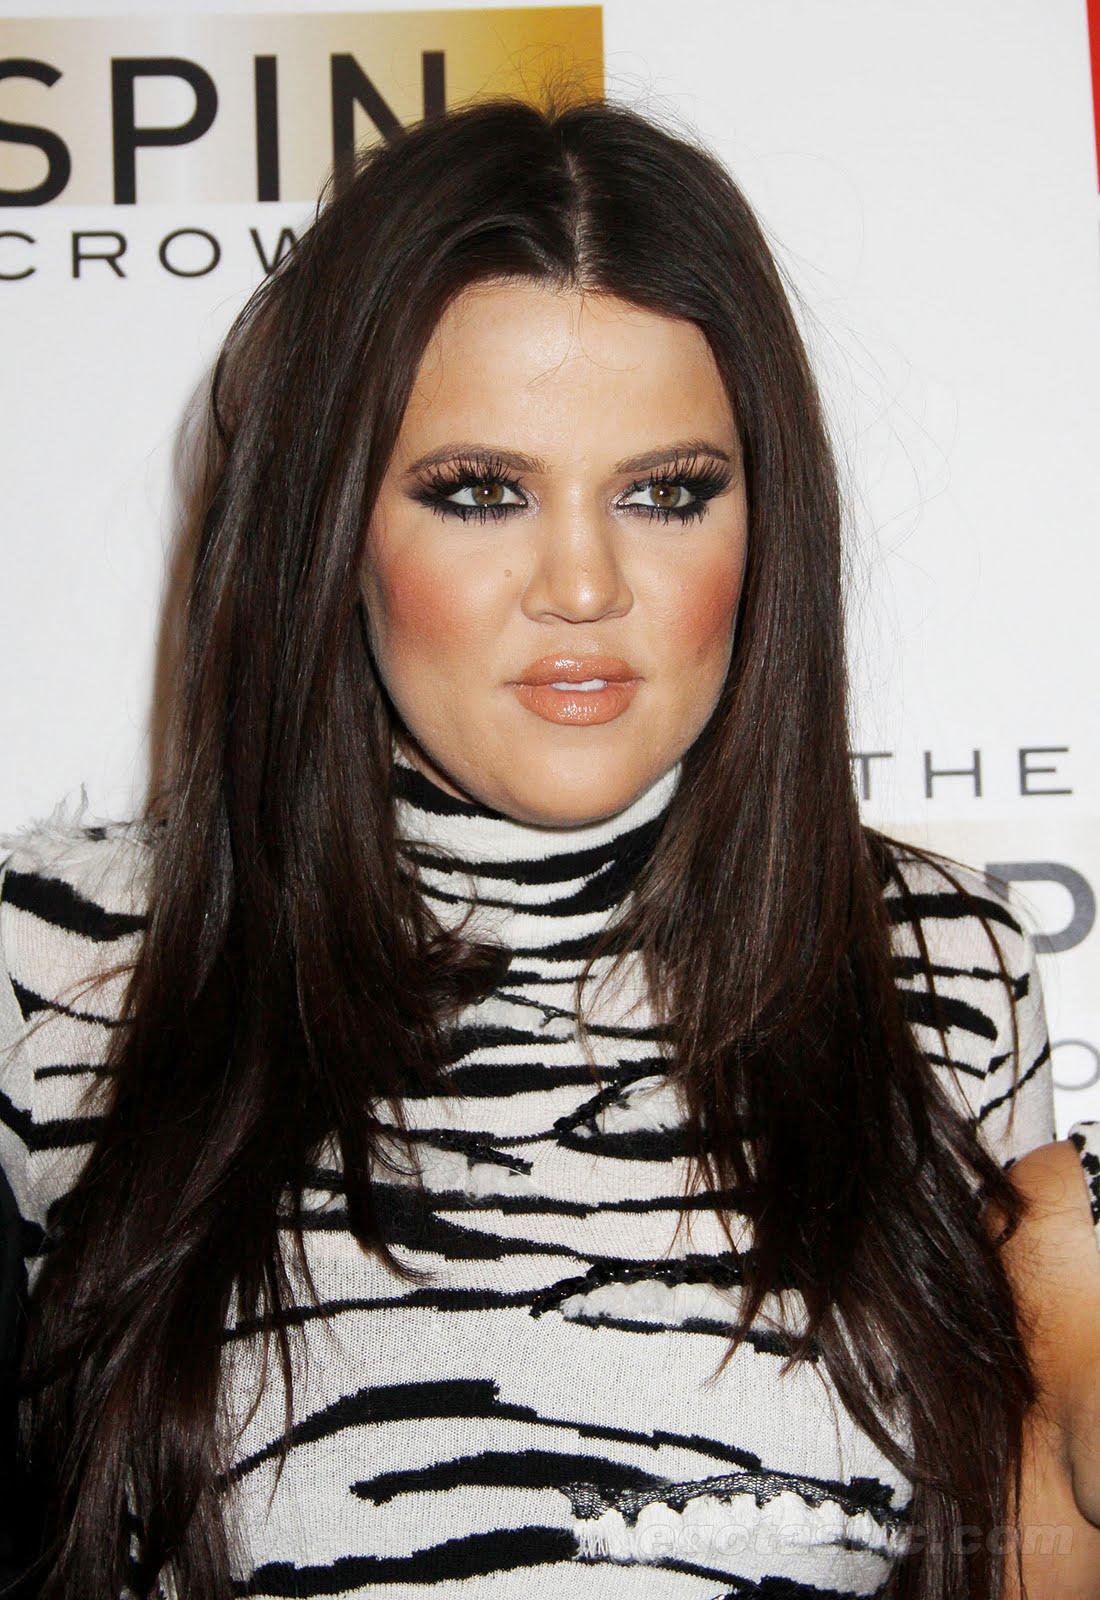 rob kardashian girlfriend: khloe kardashian hairstyles